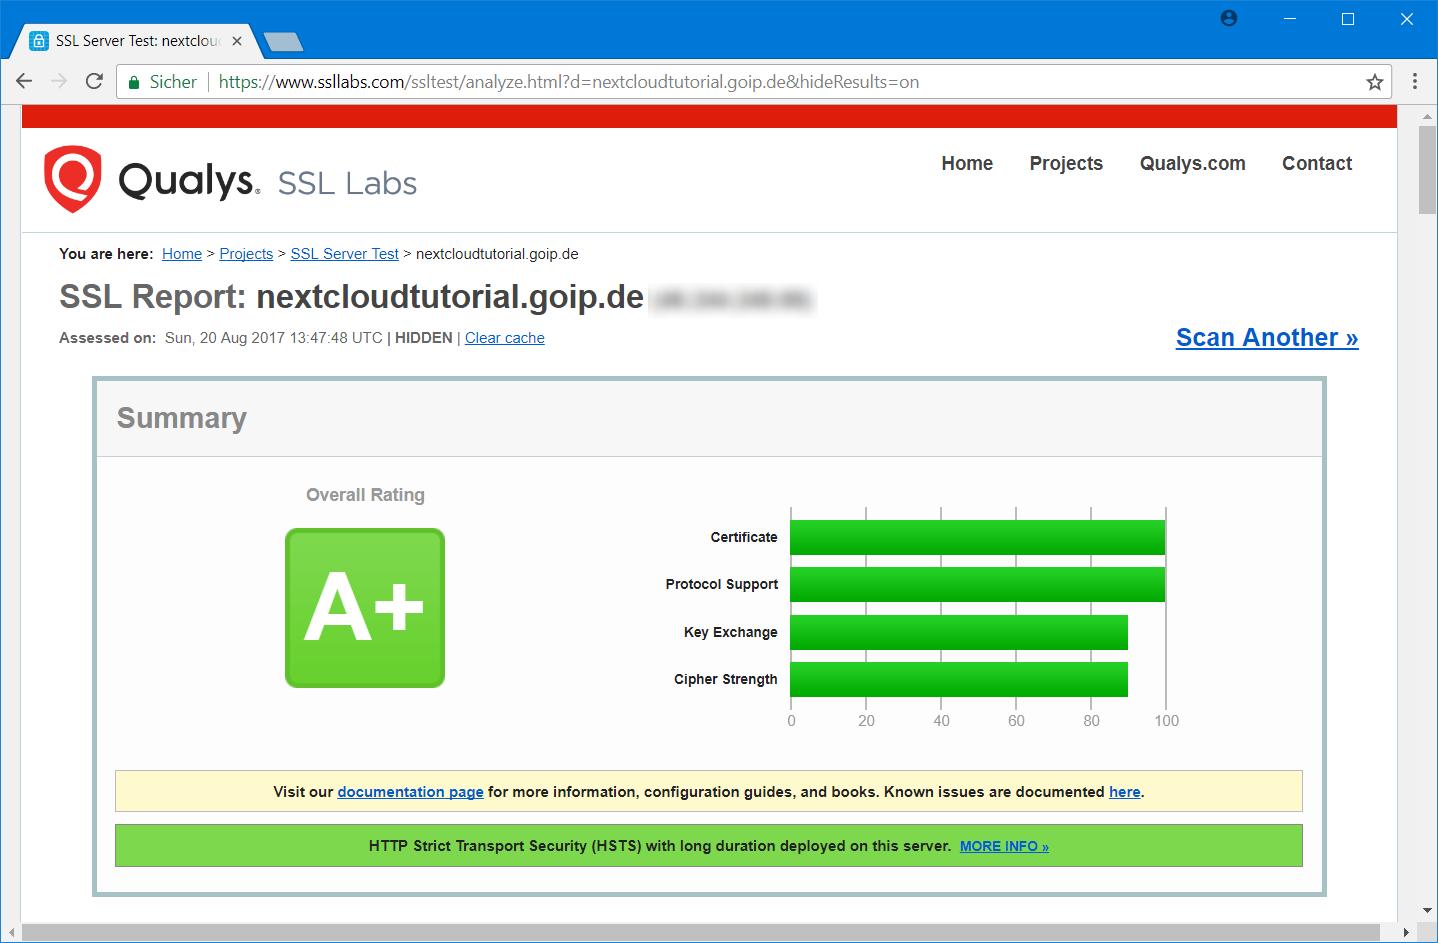 Nextcloud Auf Ubuntu Server Mit Nginx Mariadb Php Lets Encrypt